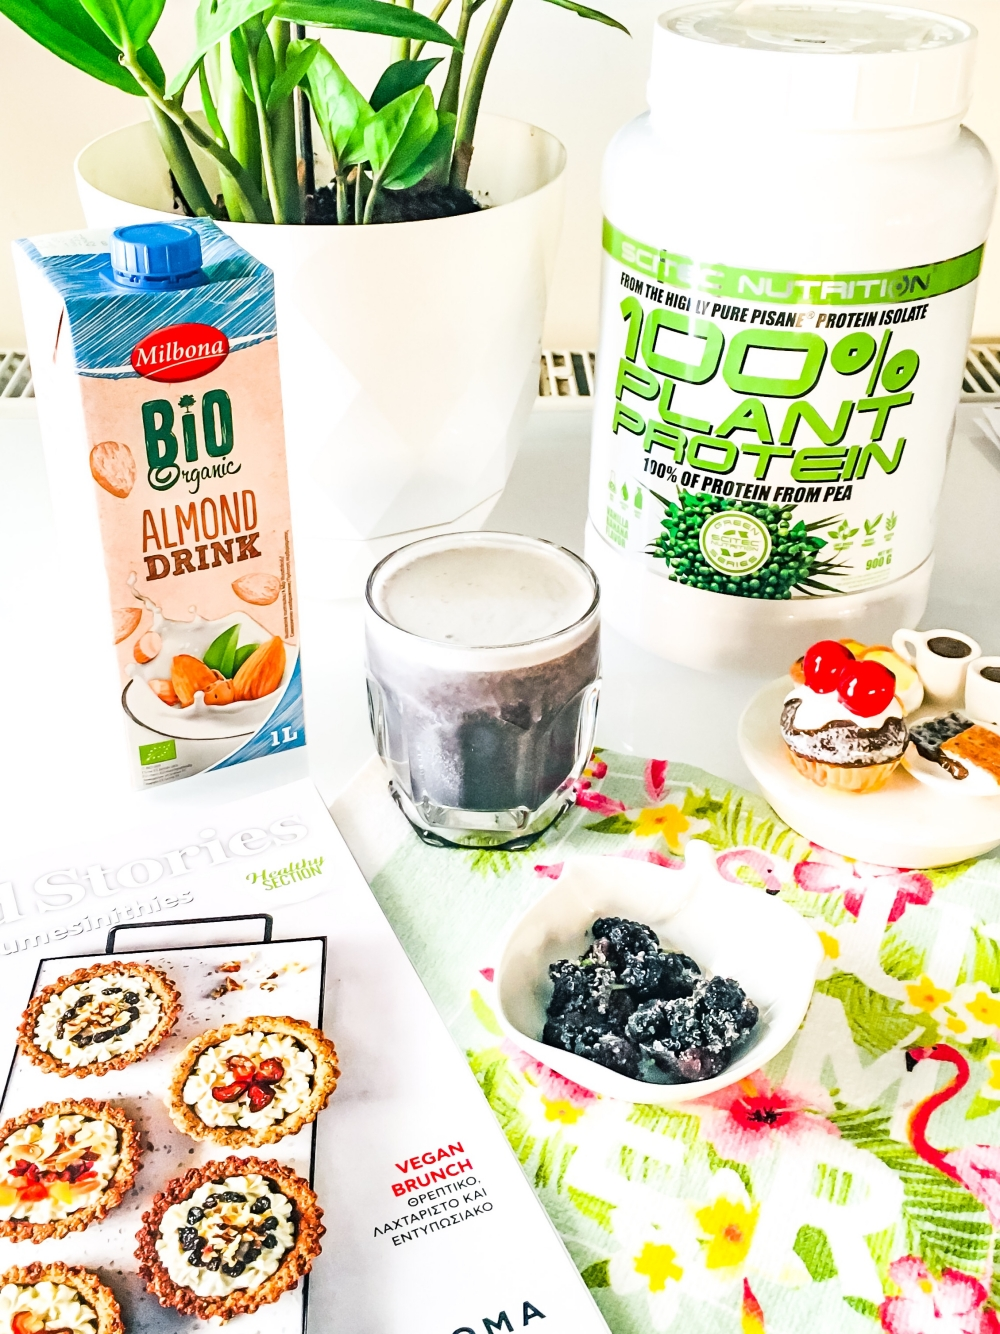 Scitec nutrition 100% plant protein; mulberry vegan protein smoothie; vegan protein shakes